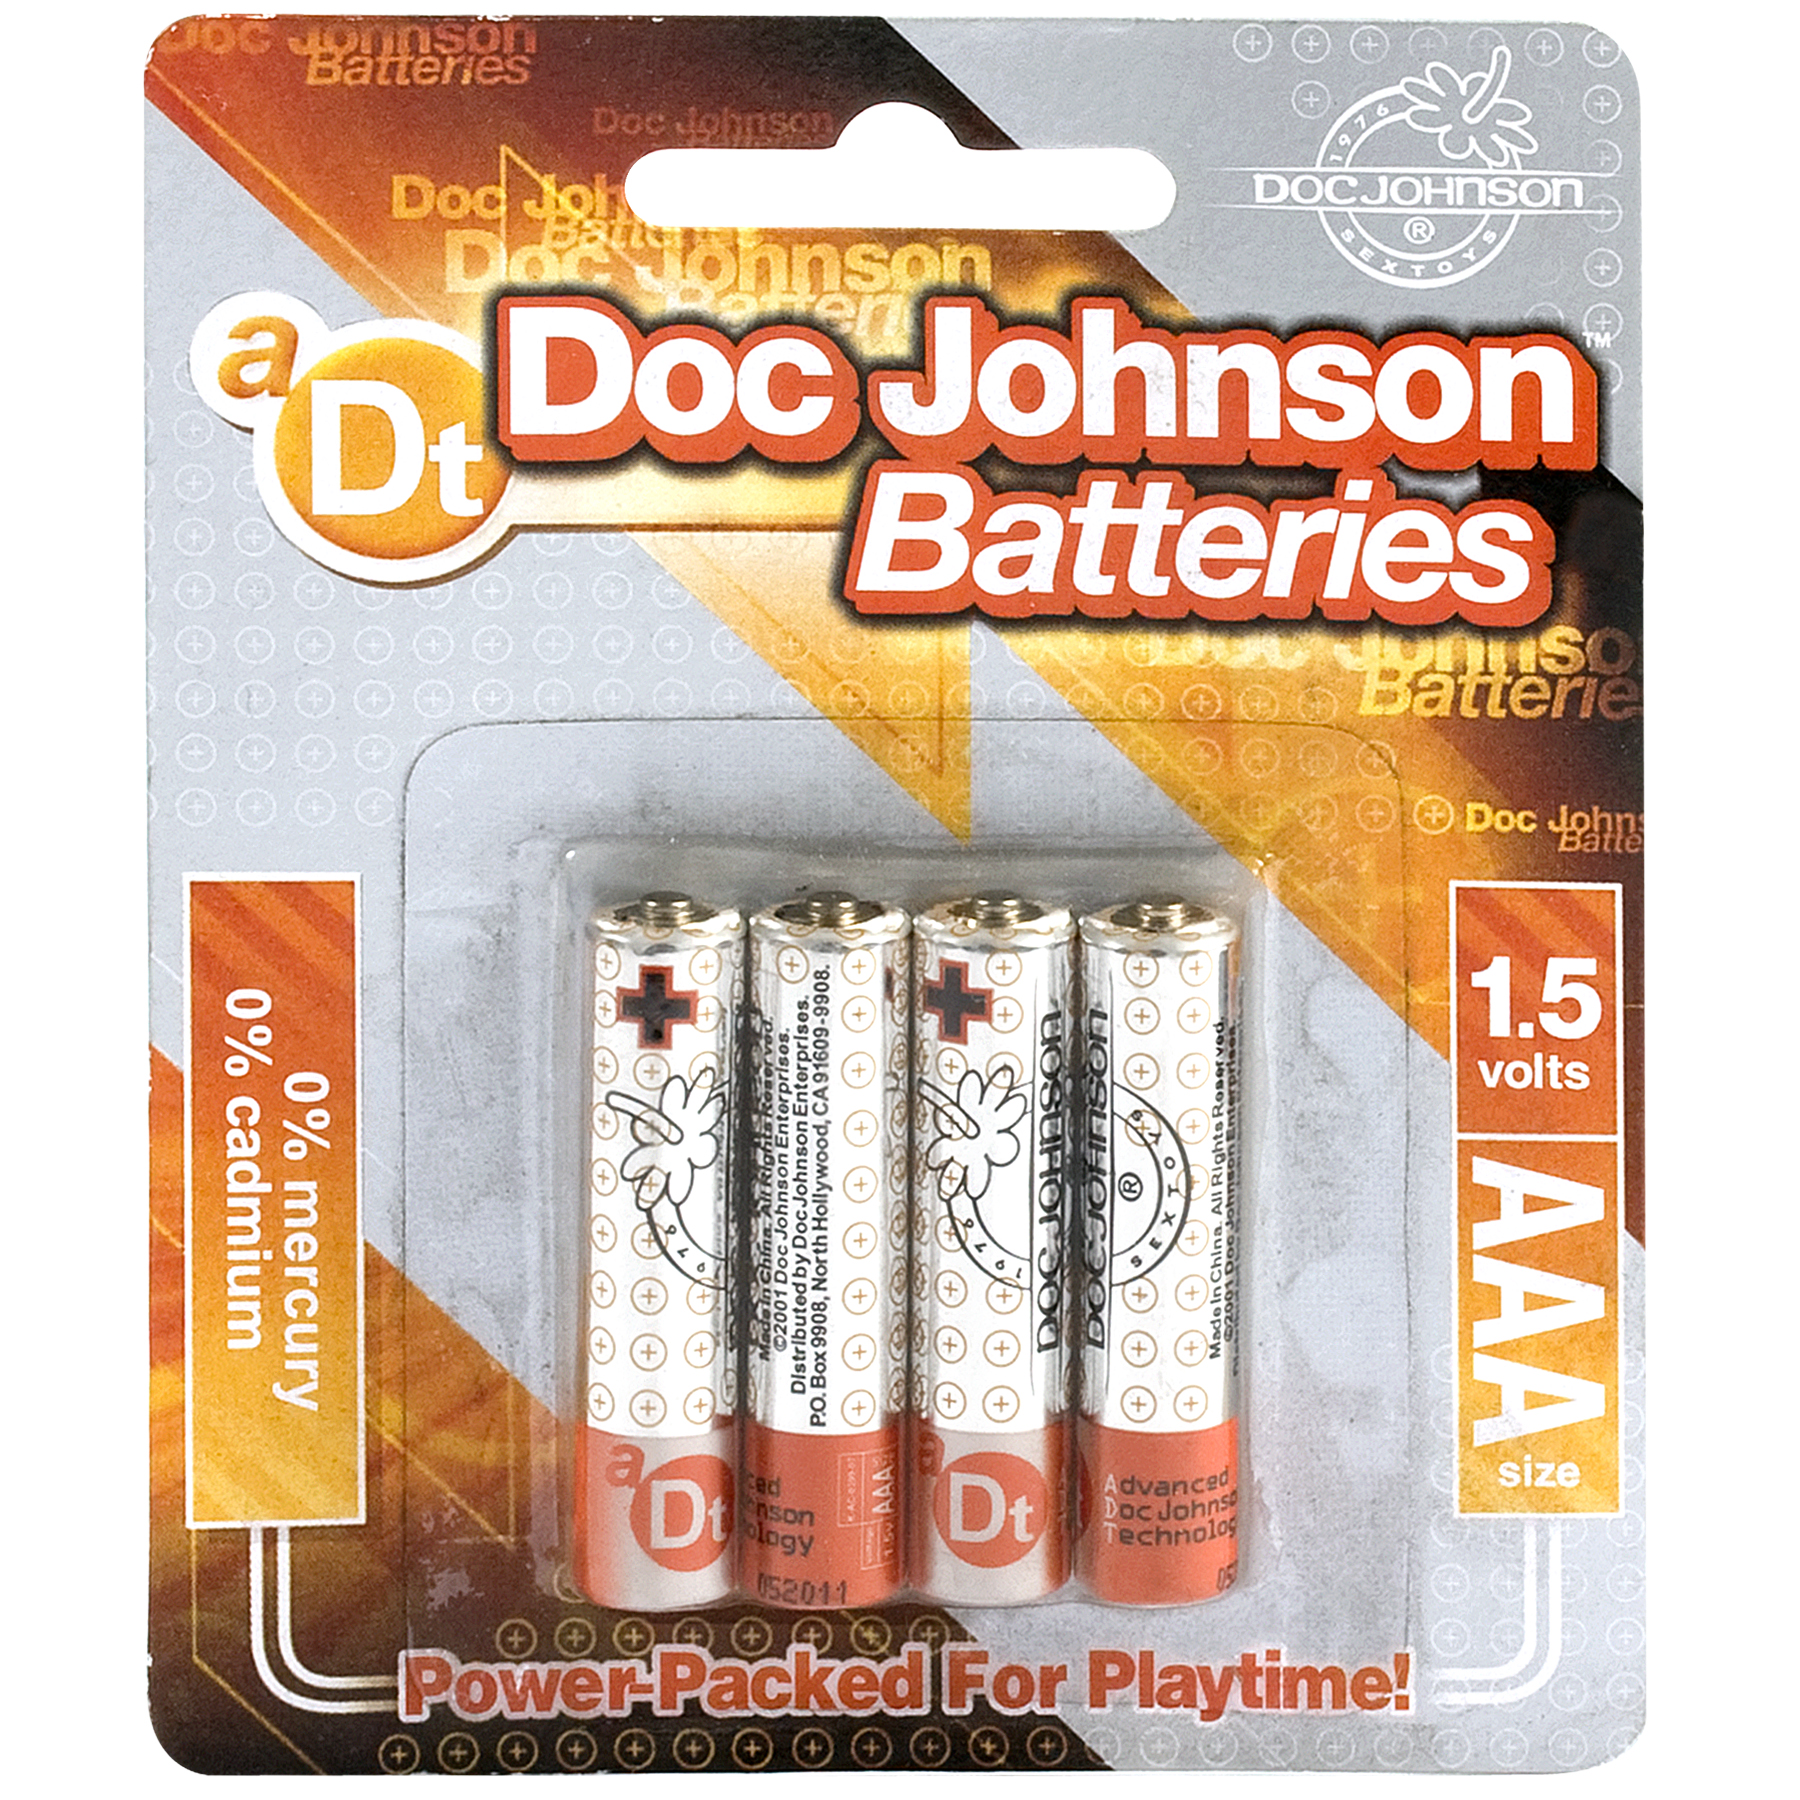 DOC JOHNSON BATTERIES AAA 4 PACK CD